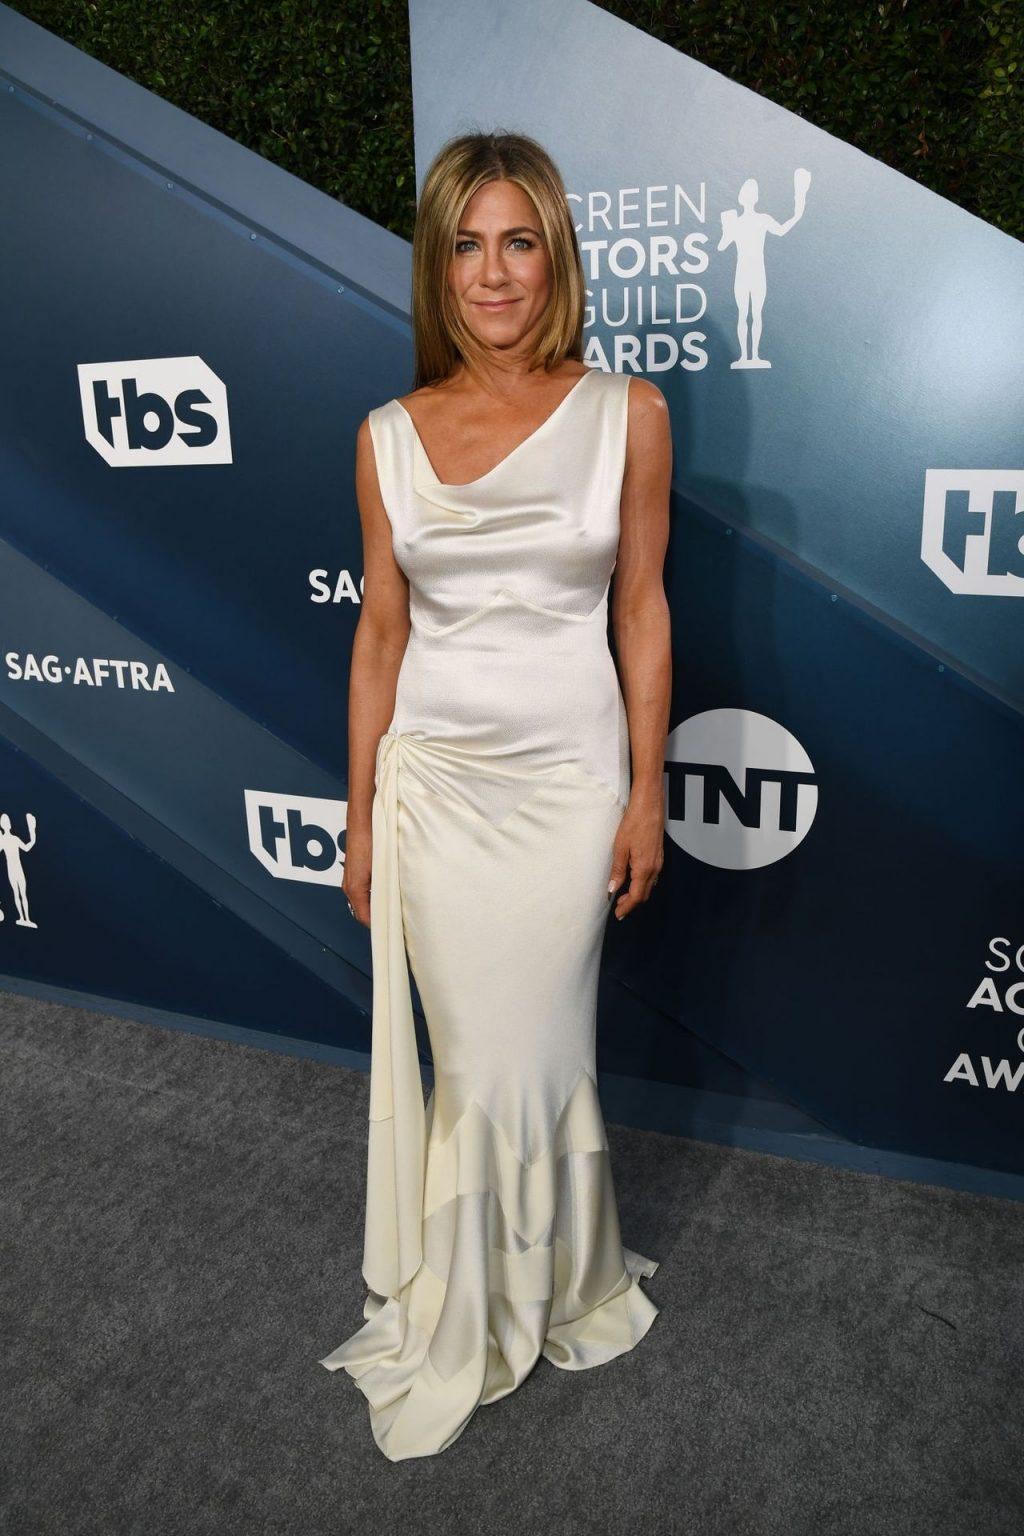 Jennifer Aniston's Pokies at the SAG Awards (136 Photos + Video)